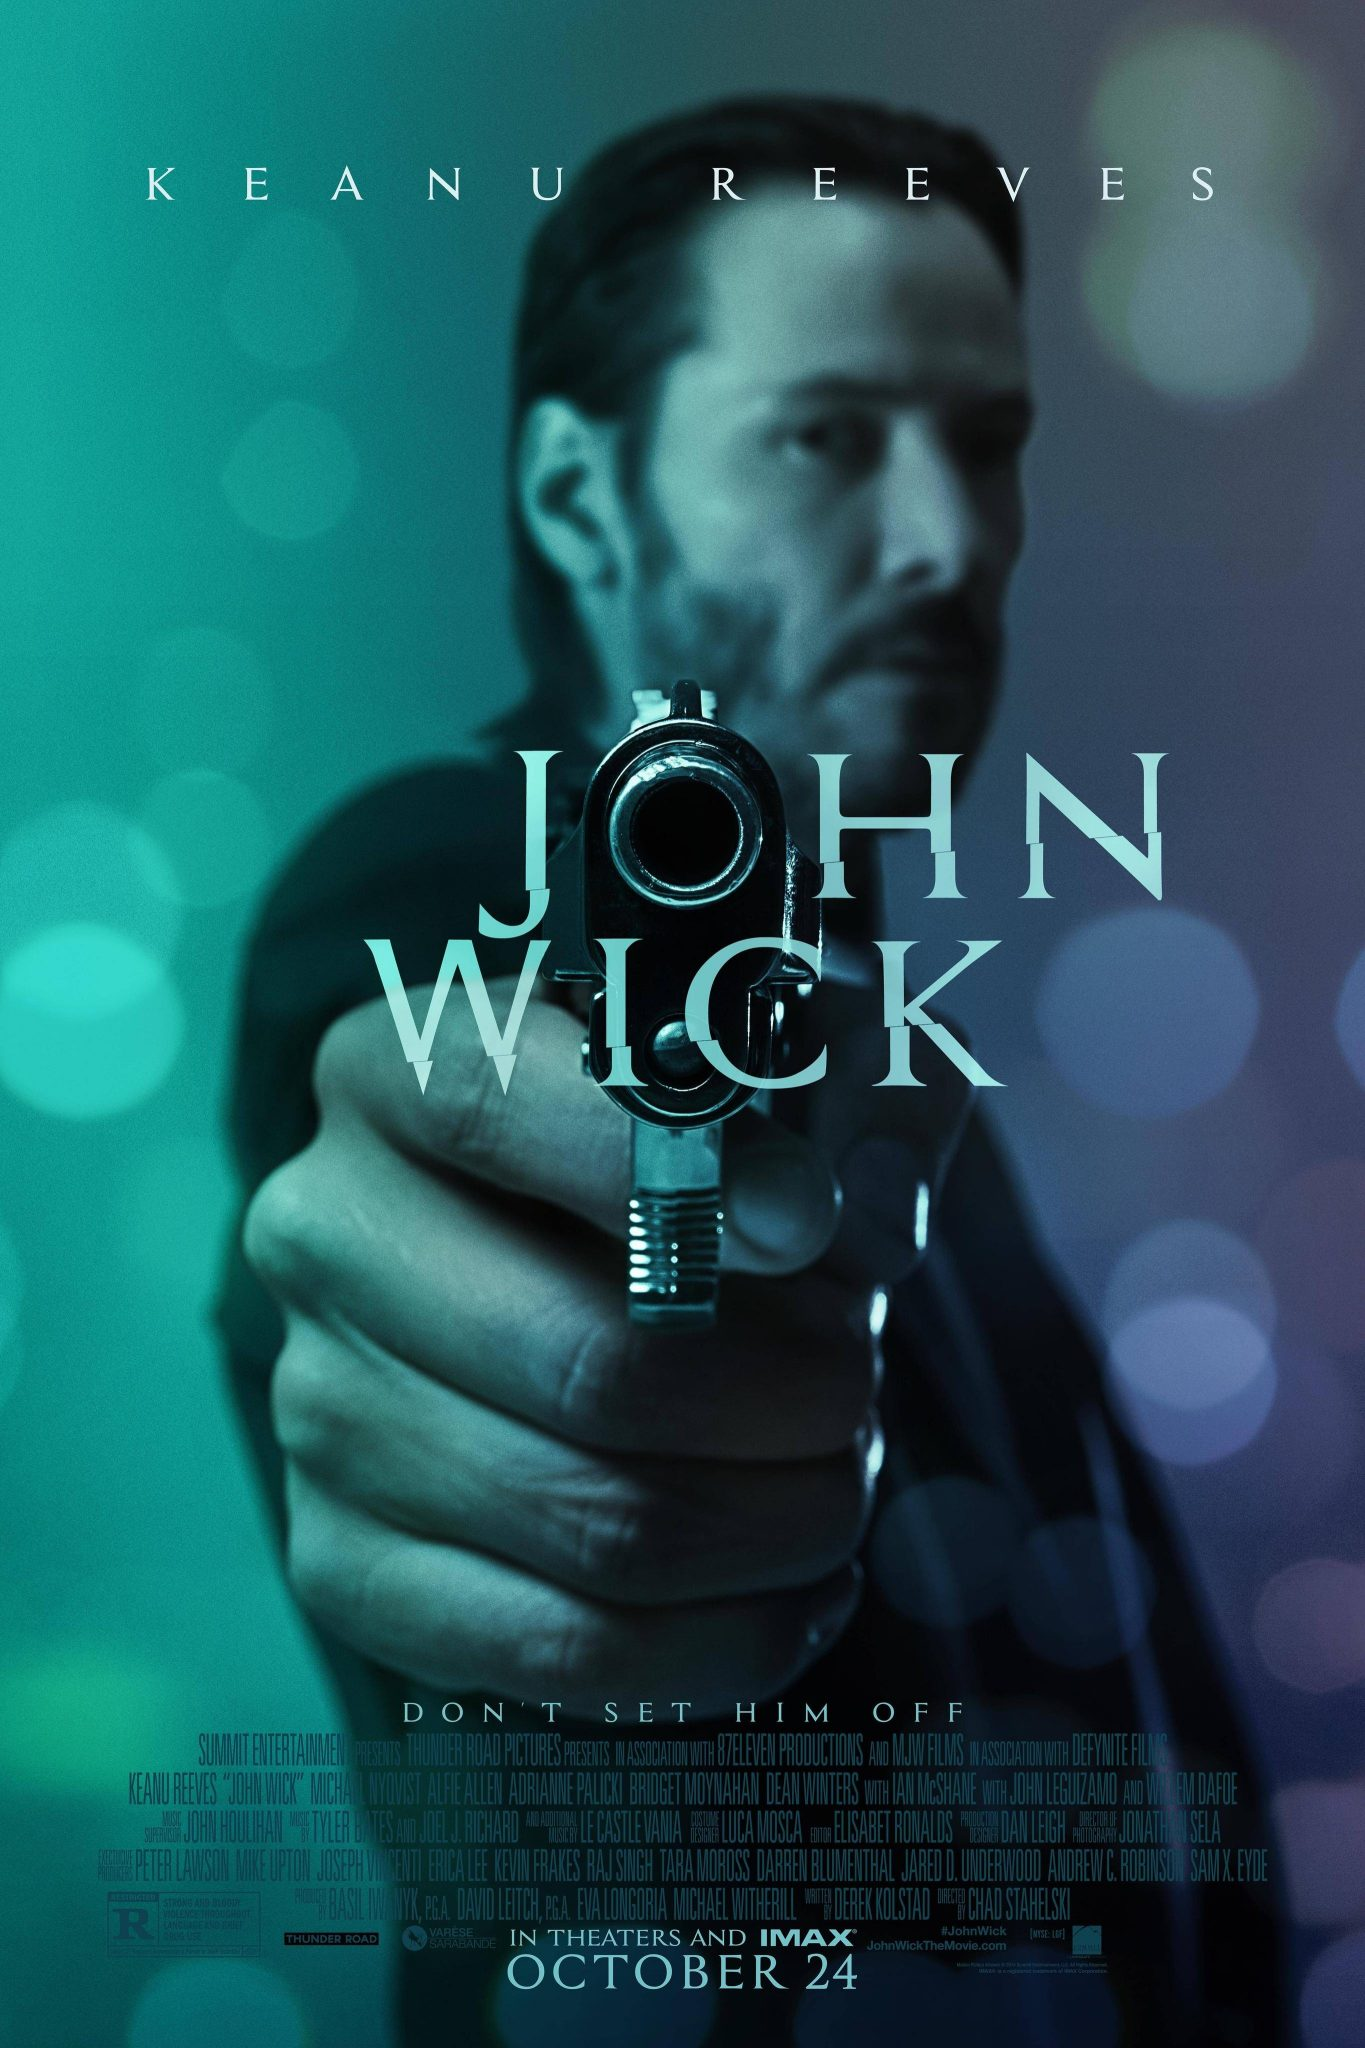 johnwick_trailer_1